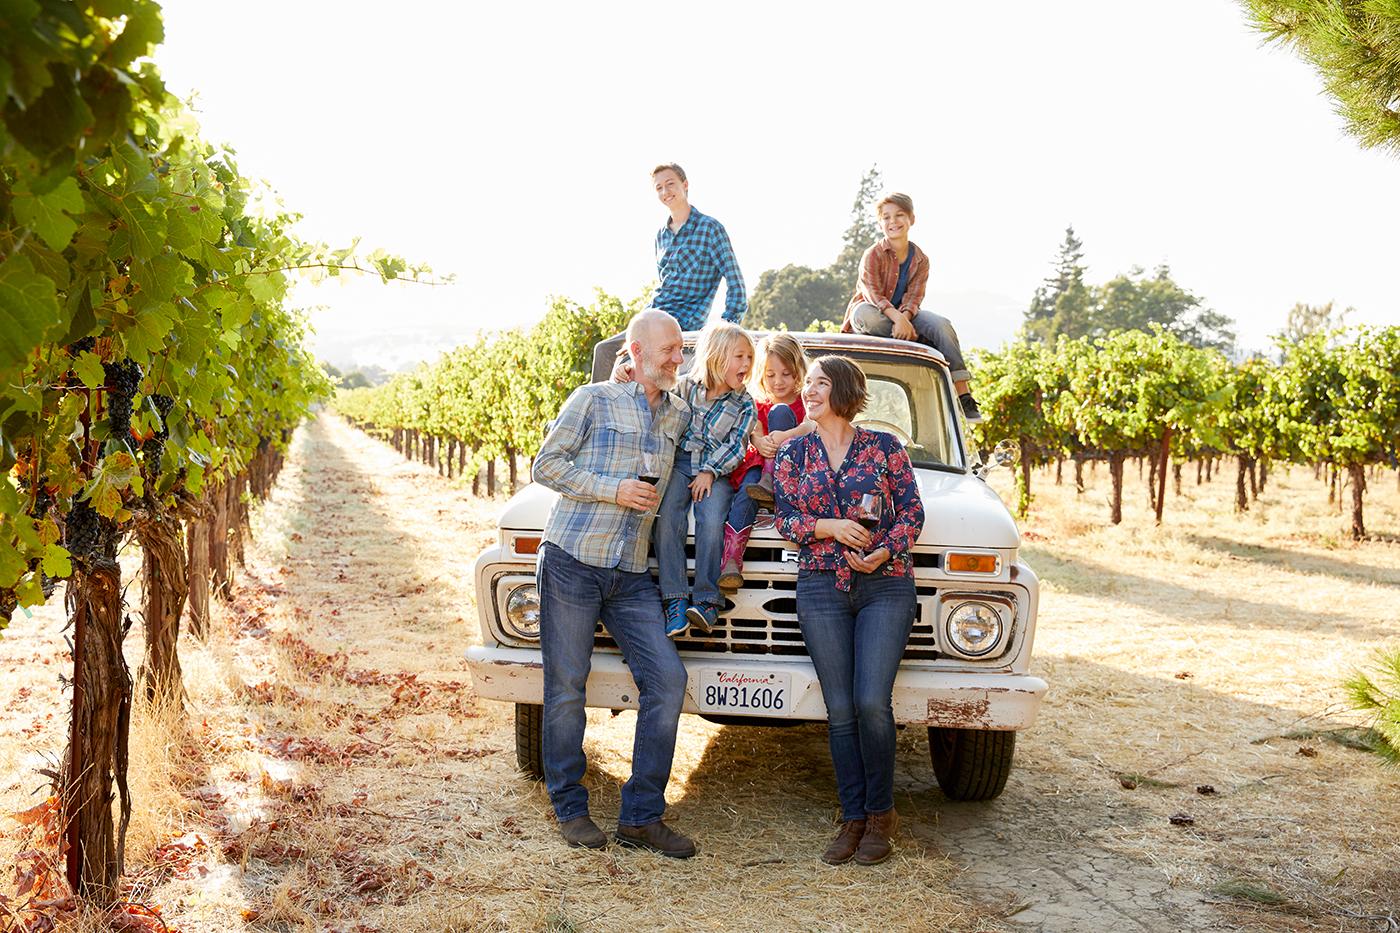 Modern Life Winemaking Family